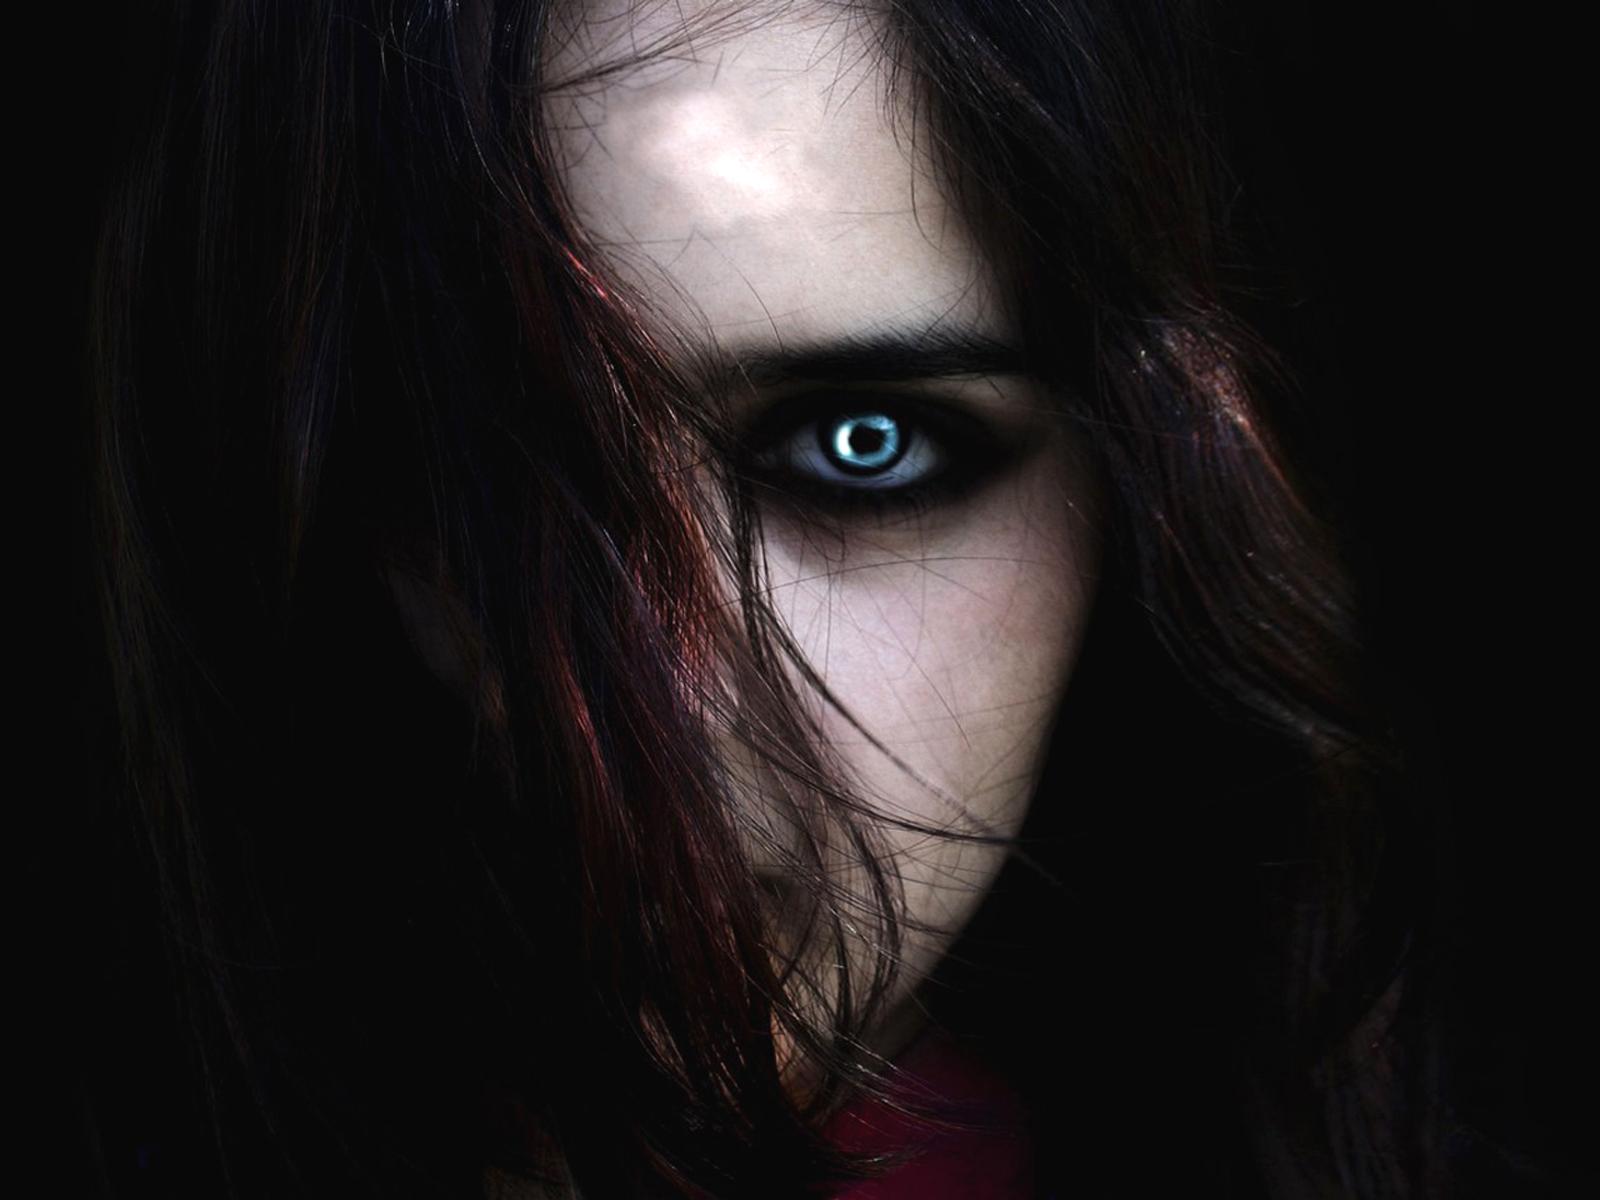 3d Art Wallpaper Blue Eyed Girl 171 Vampire Hd Wallpapers Background Images Wallpaper